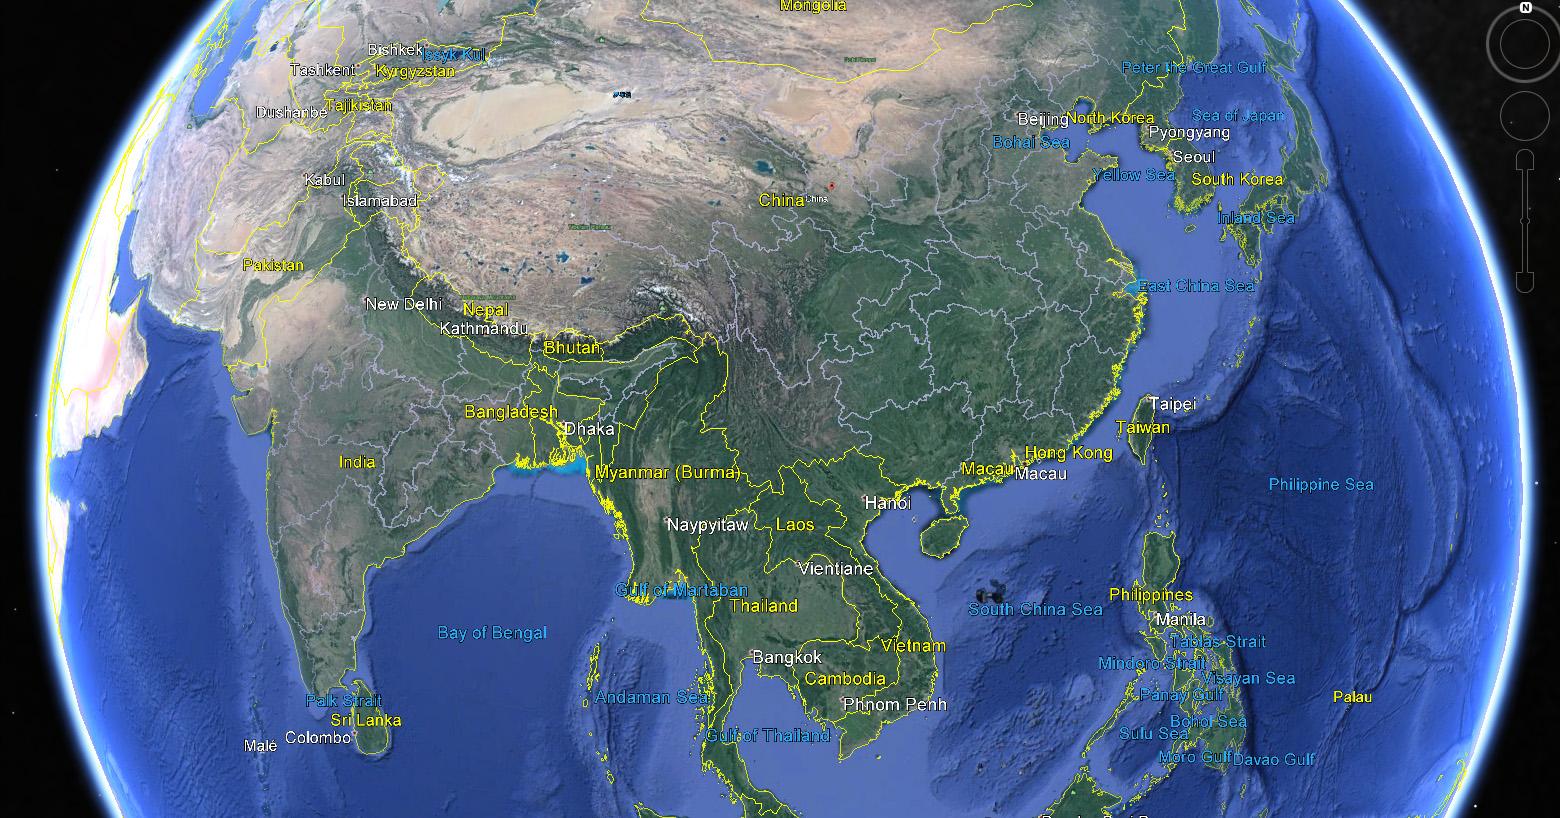 China on Google Earth